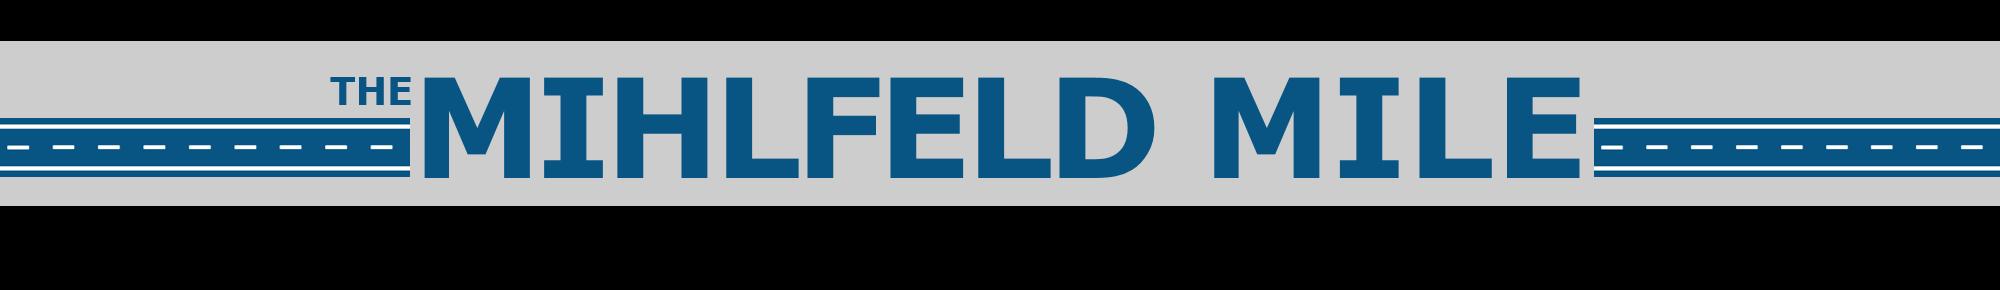 Mihlfeld Mile 2-1